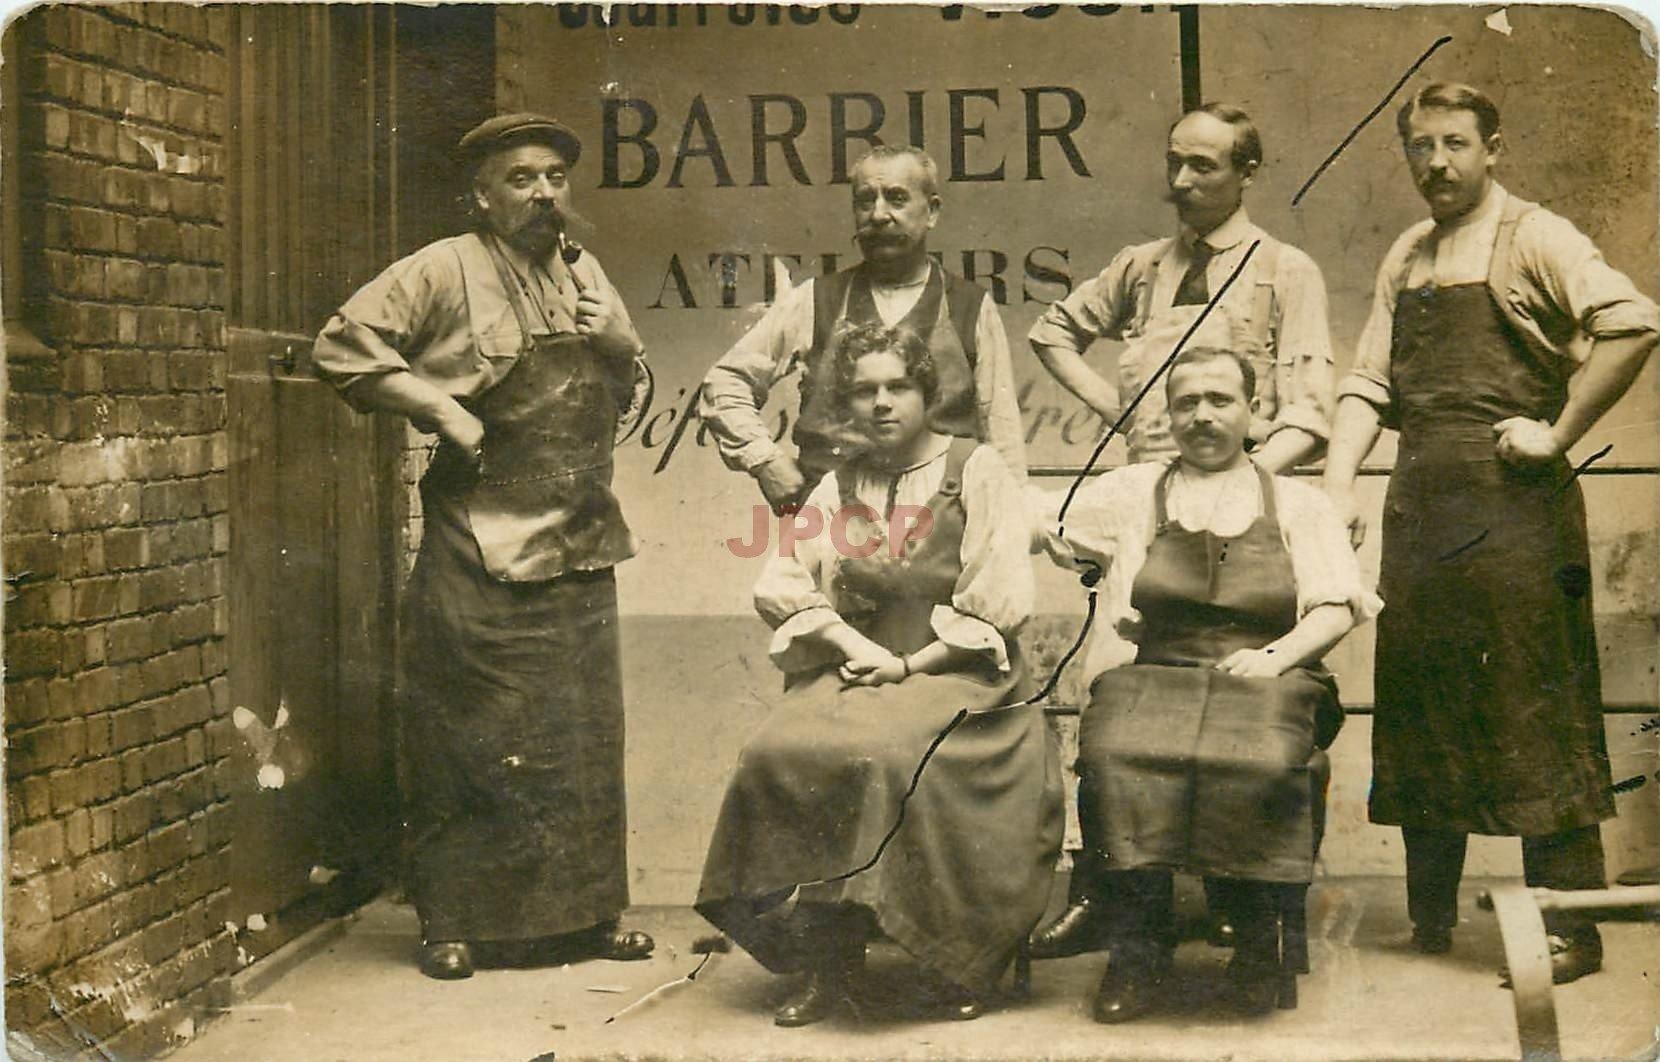 METIERS. Atelier de Barbier ou école de Barbiers. Photo carte postale